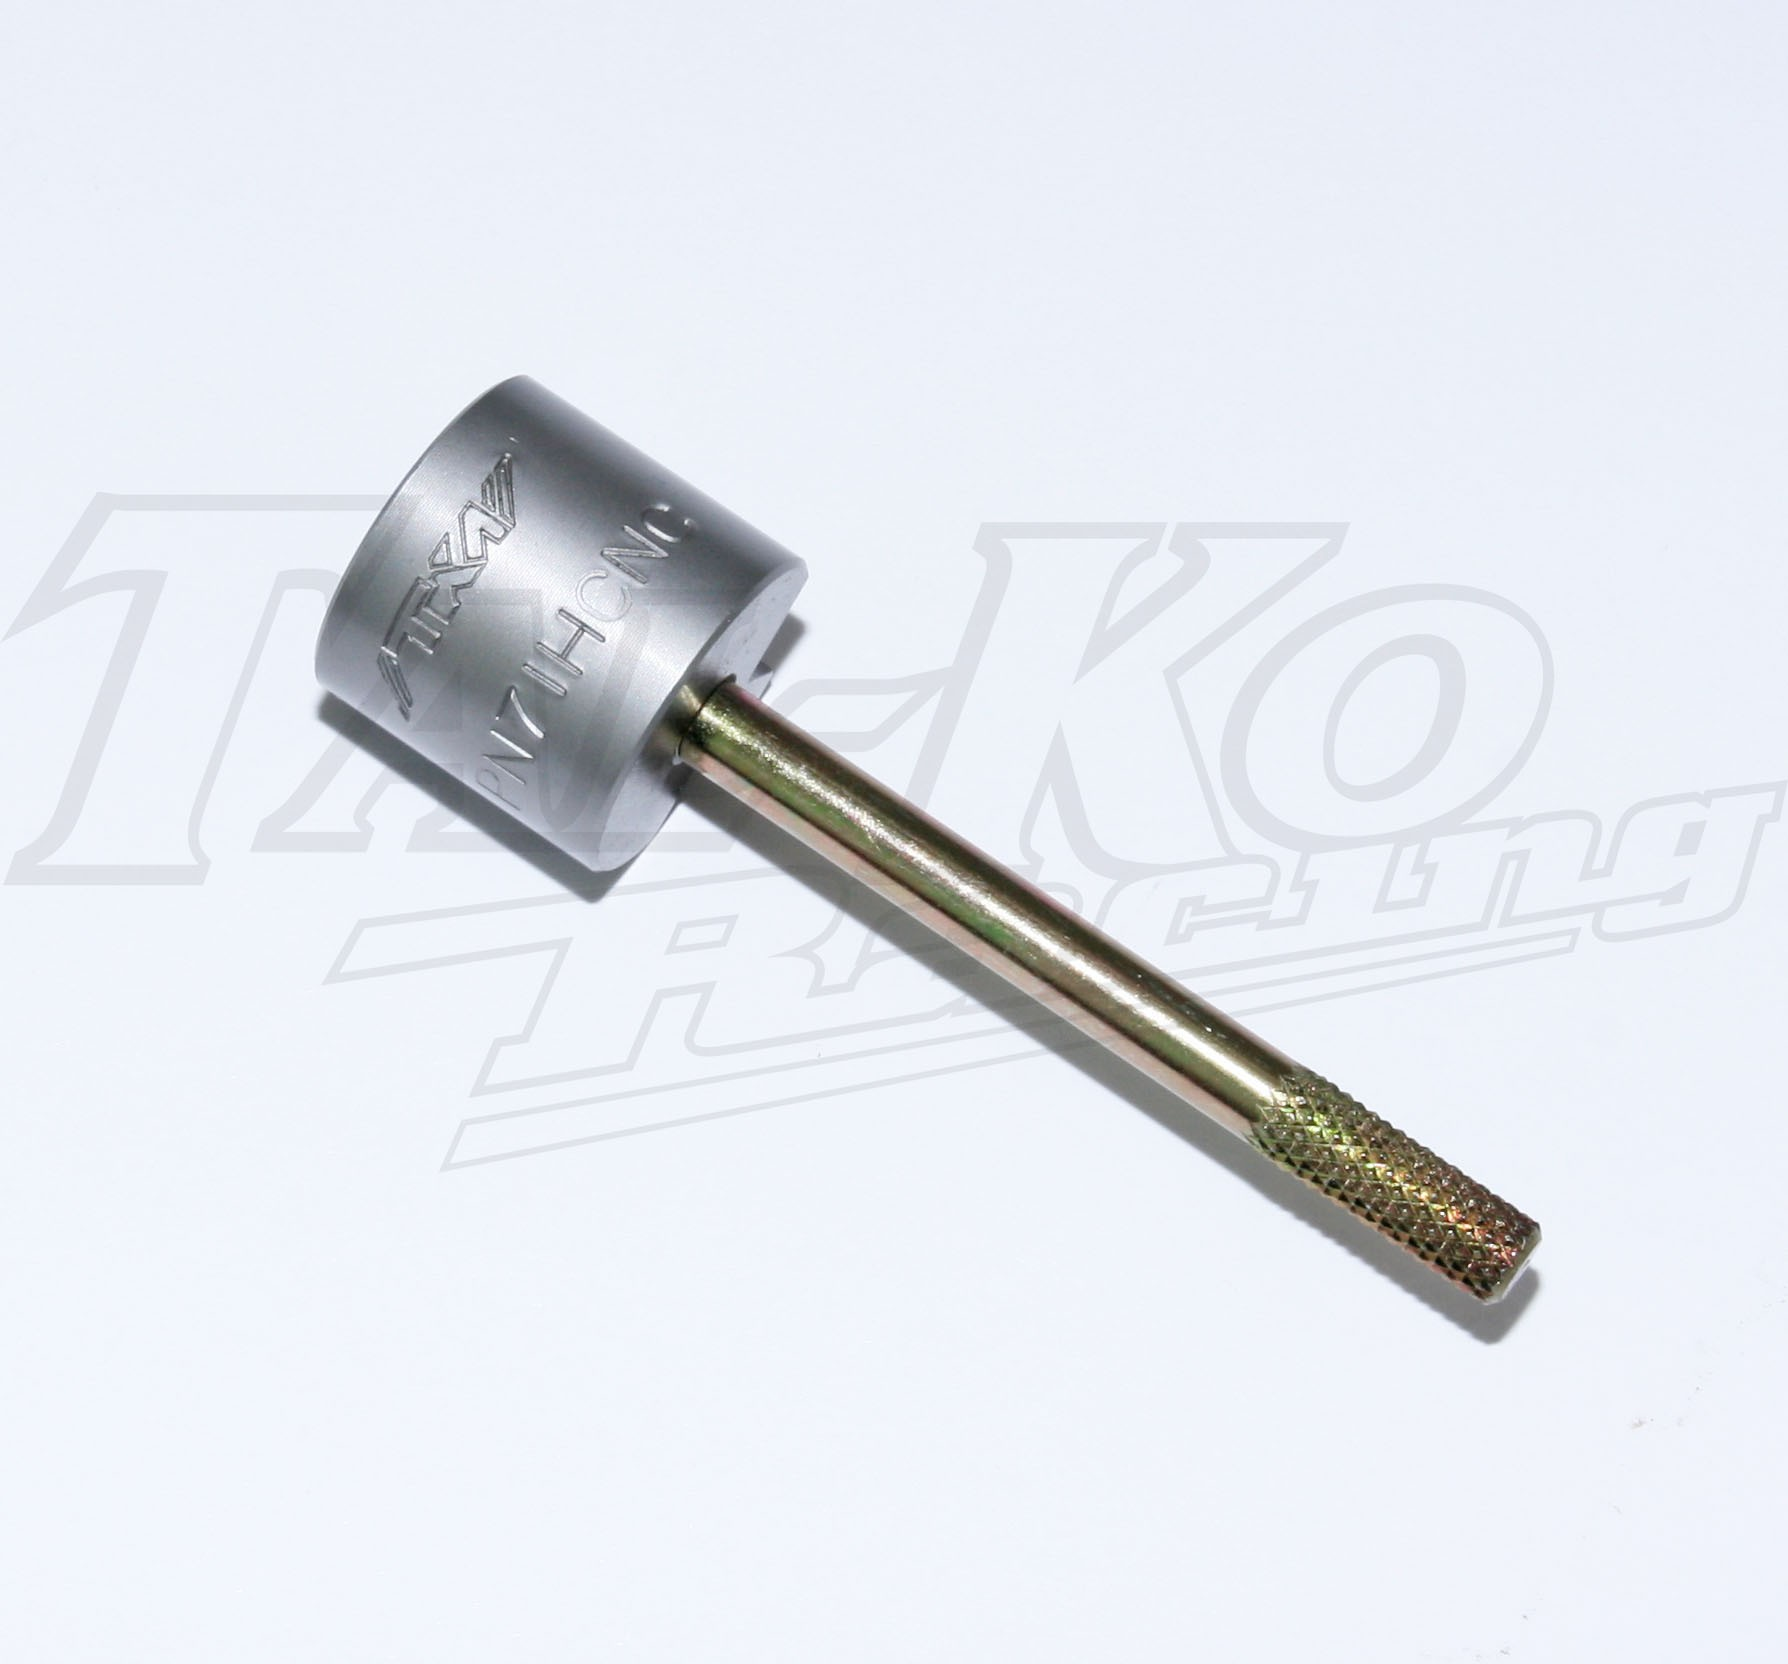 TKM BT82 FICHE CNC  INLET PORT HEIGHT GAUGE